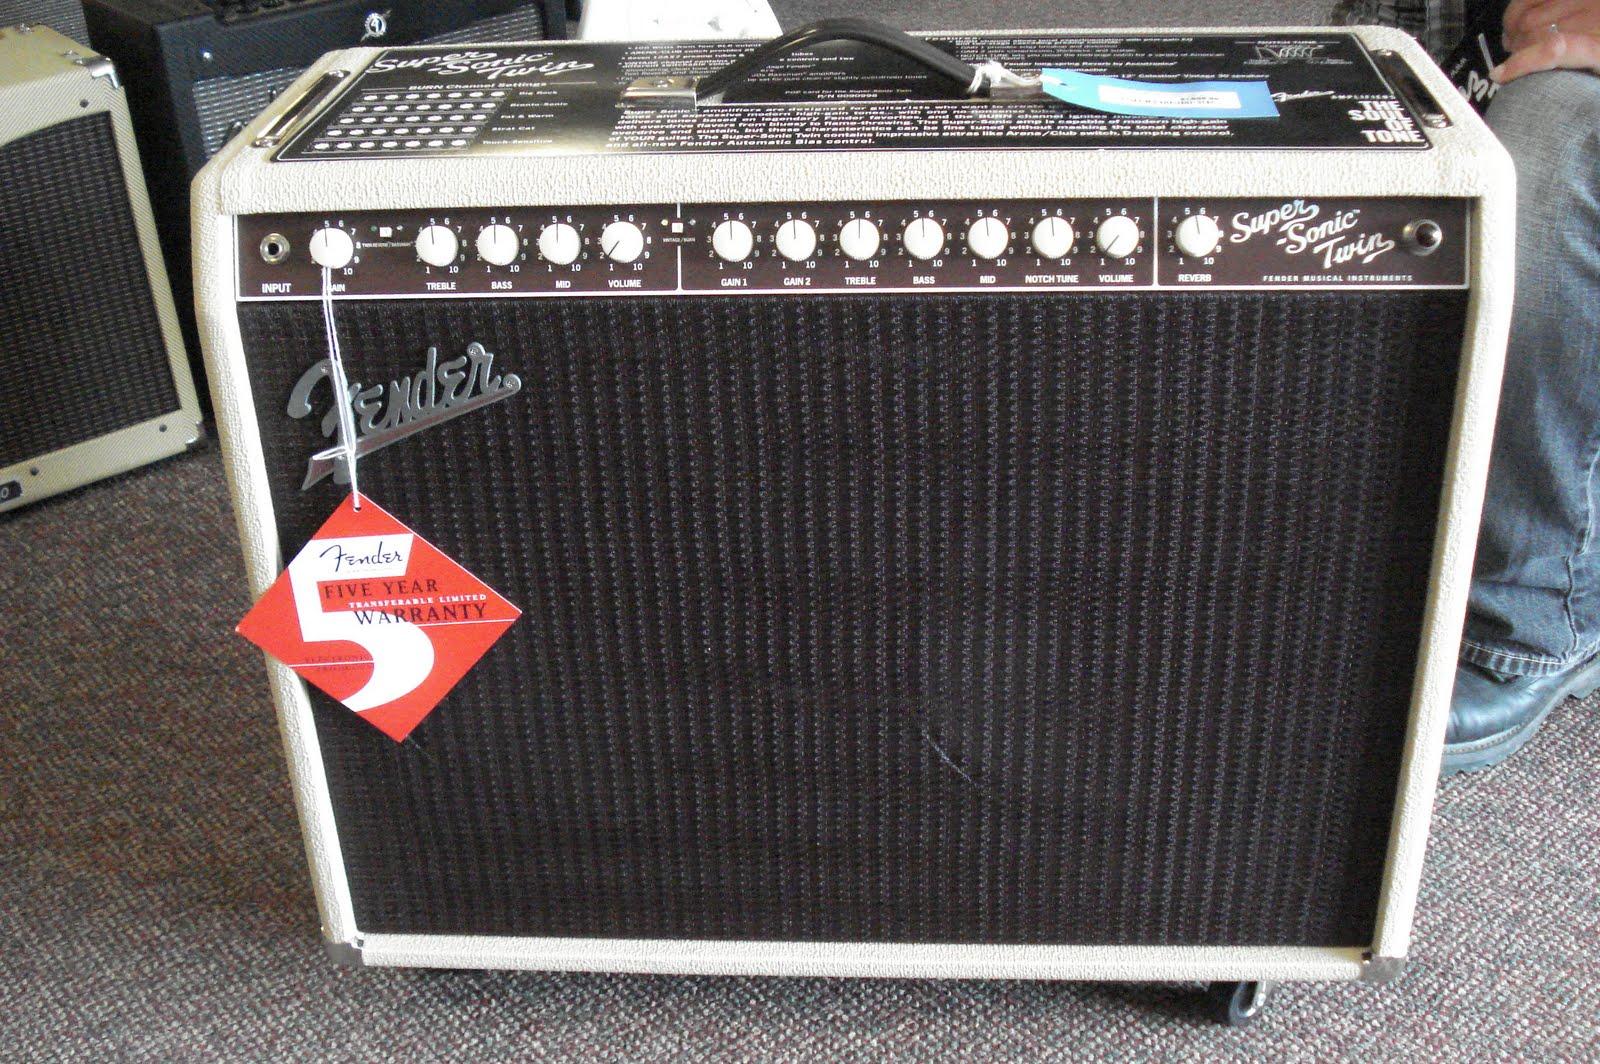 Fender Supersonic Twin : news and updates new fender super sonic twin in stock ~ Hamham.info Haus und Dekorationen